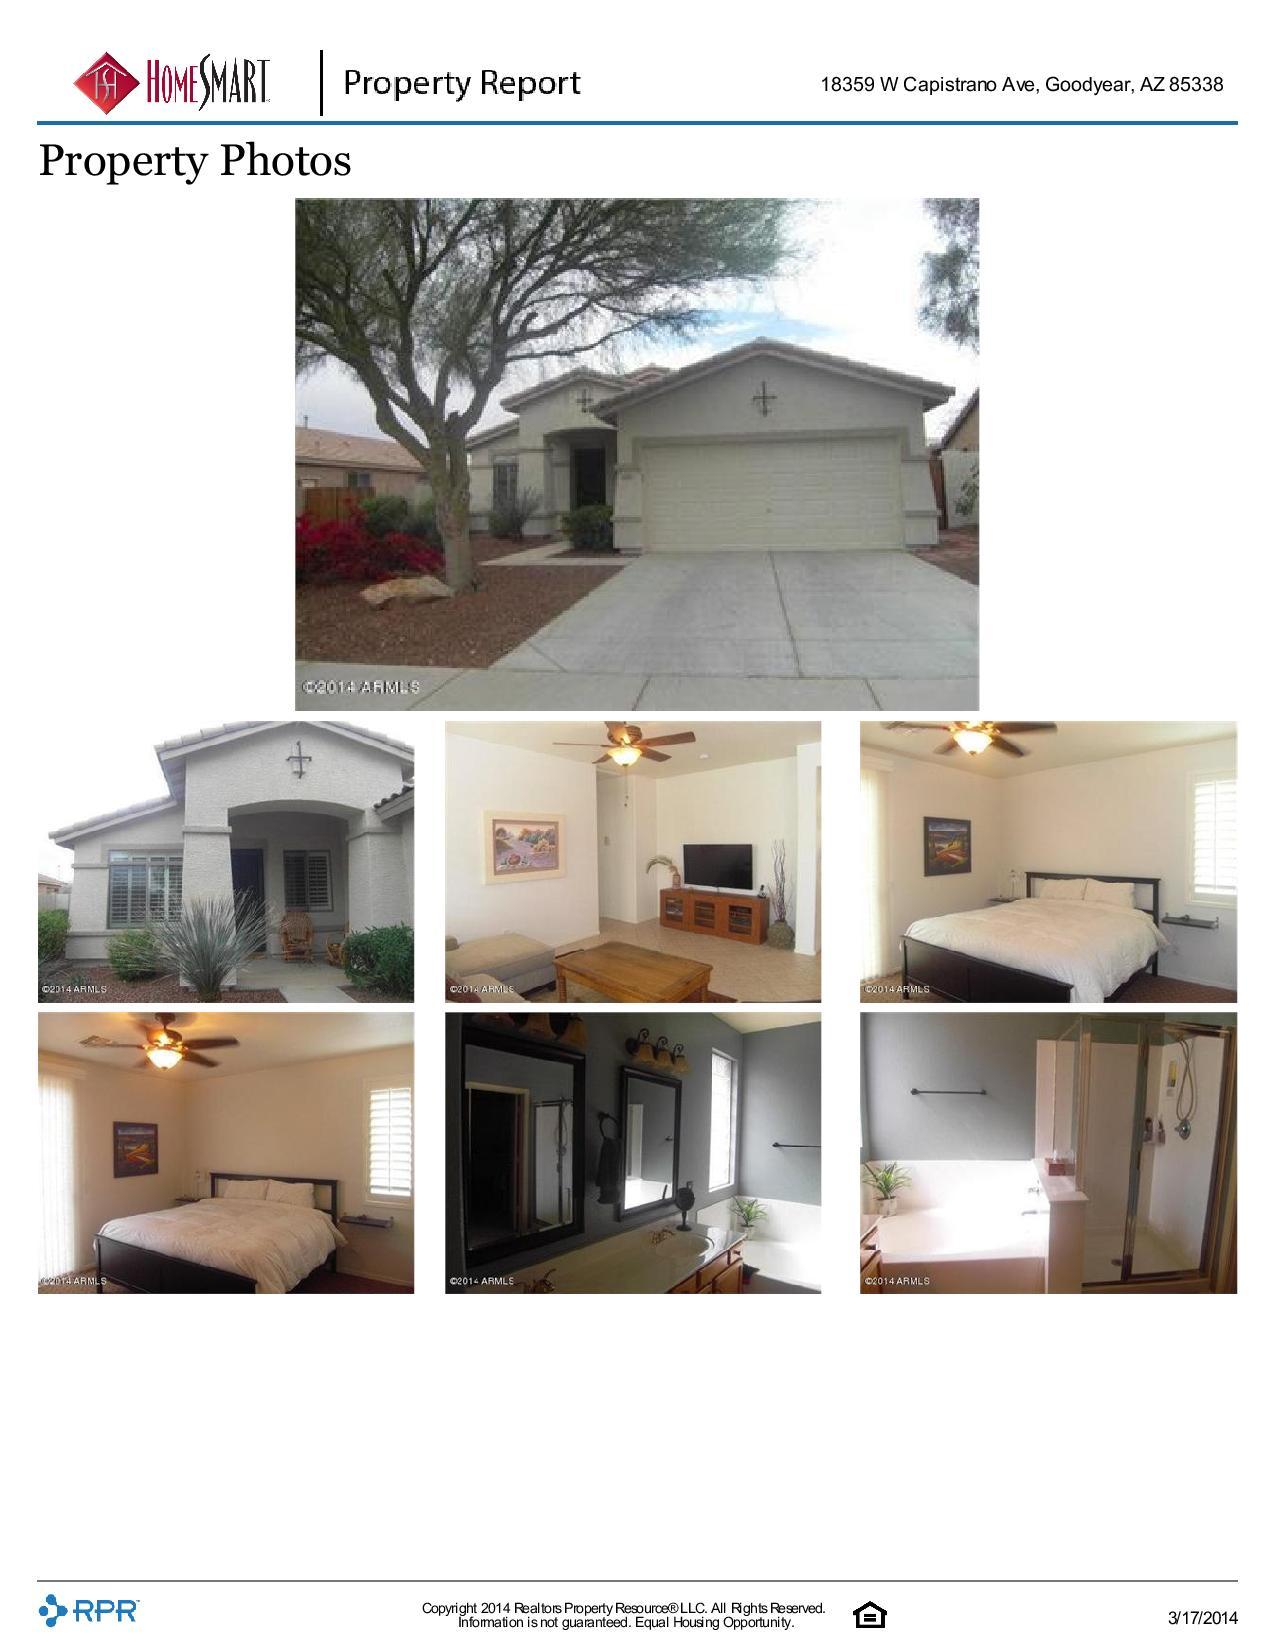 18359-W-Capistrano-Ave-Goodyear-AZ-85338-page-005